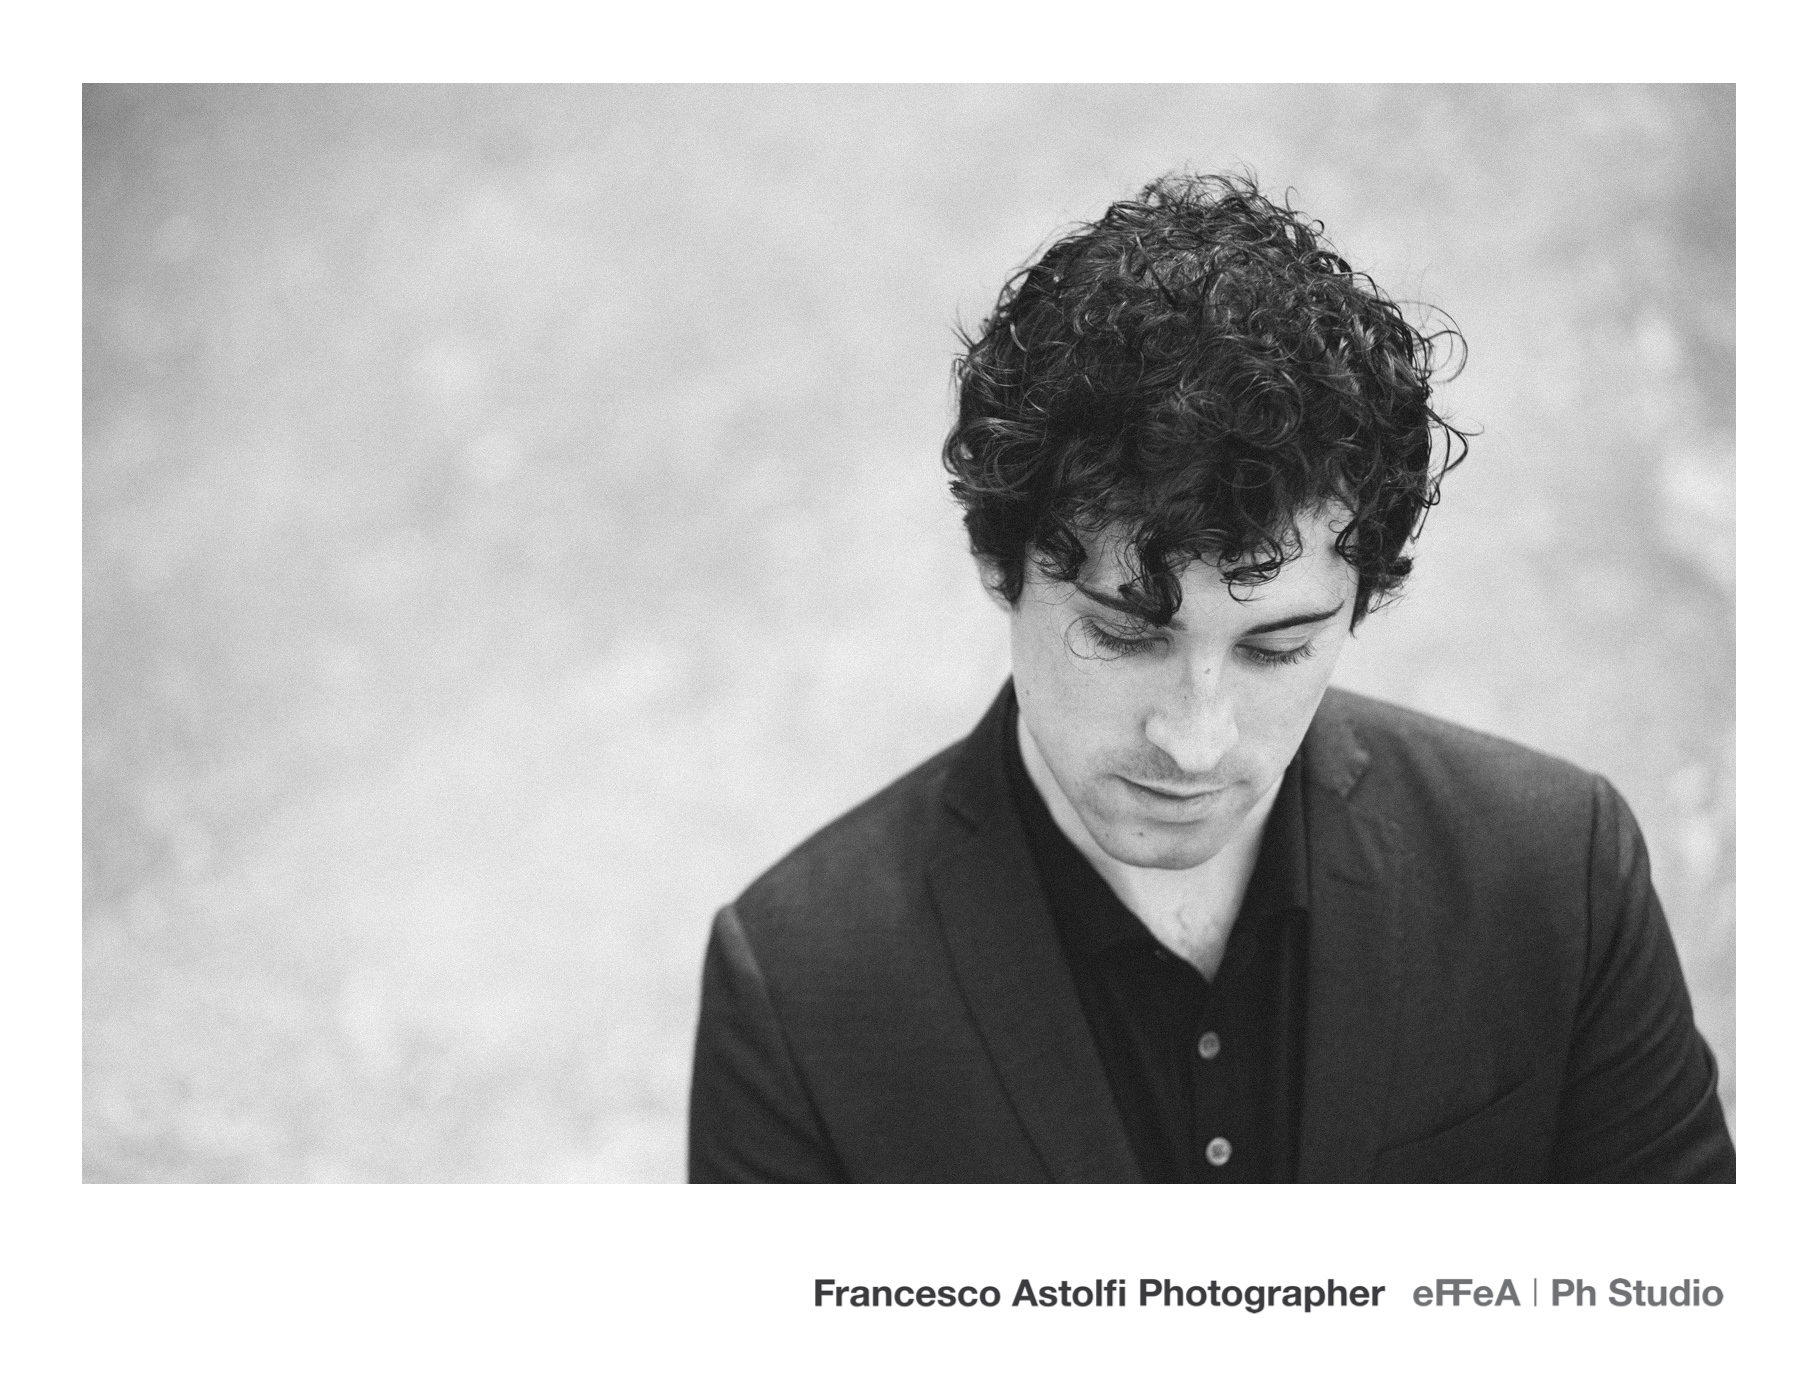 007 - Gentile Catone - Photo by Francesco Astolfi